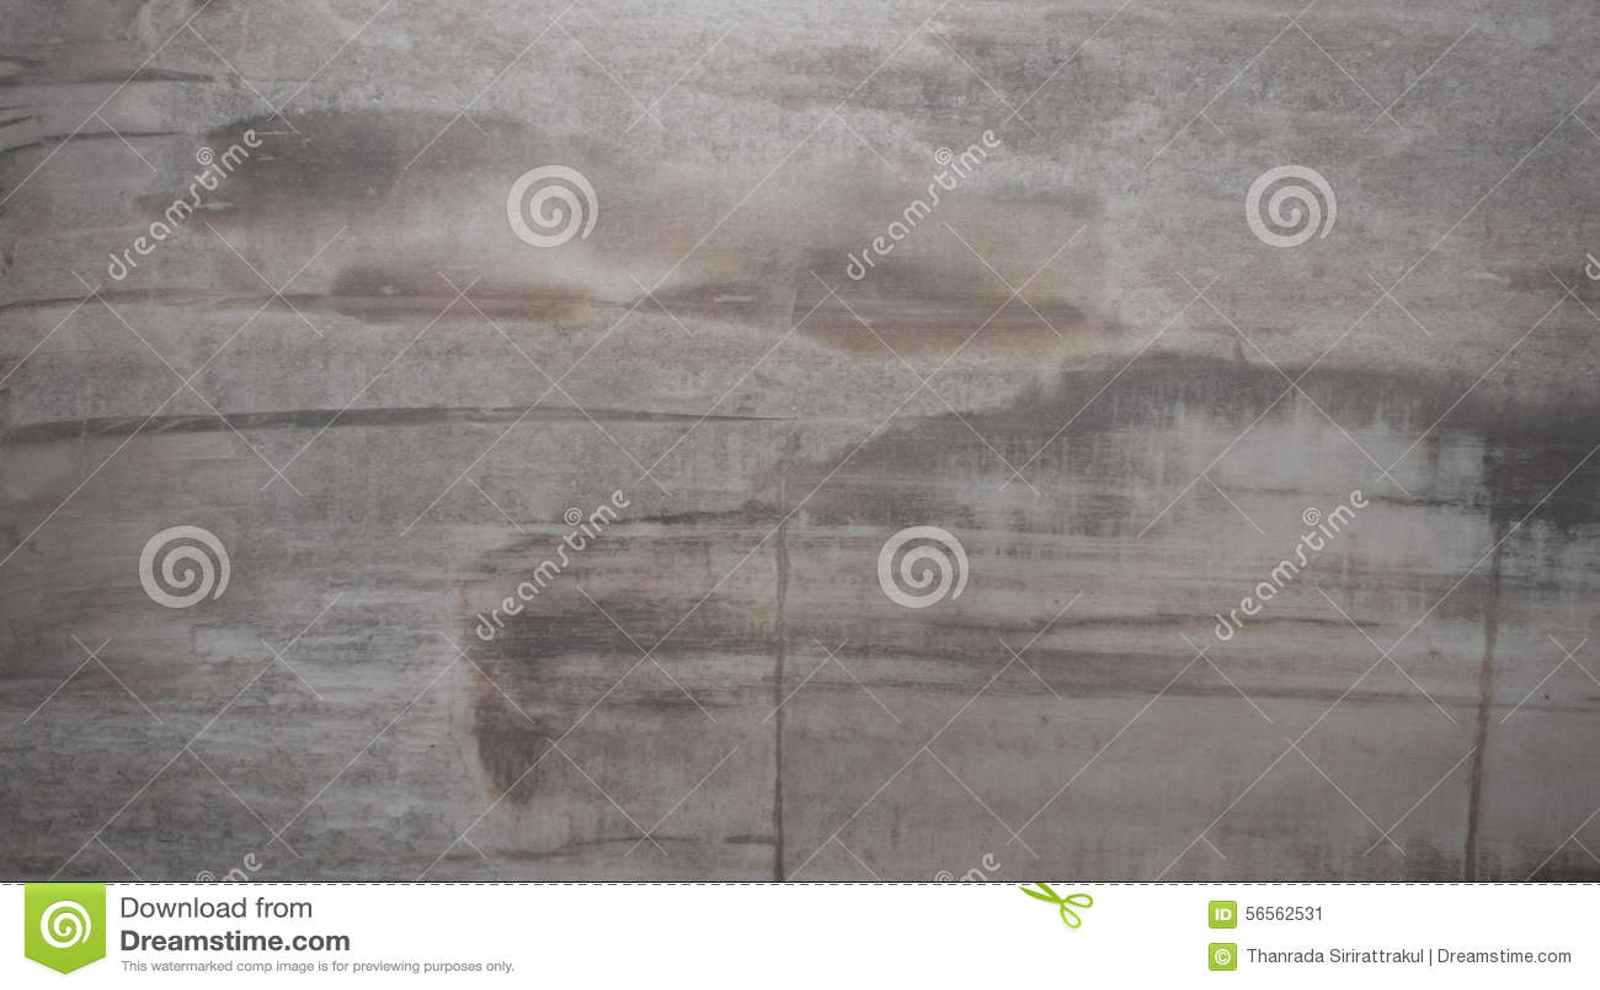 Download Σχέδιο συμπαγών τοίχων στοκ εικόνα. εικόνα από επικονιασμένος - 56562531